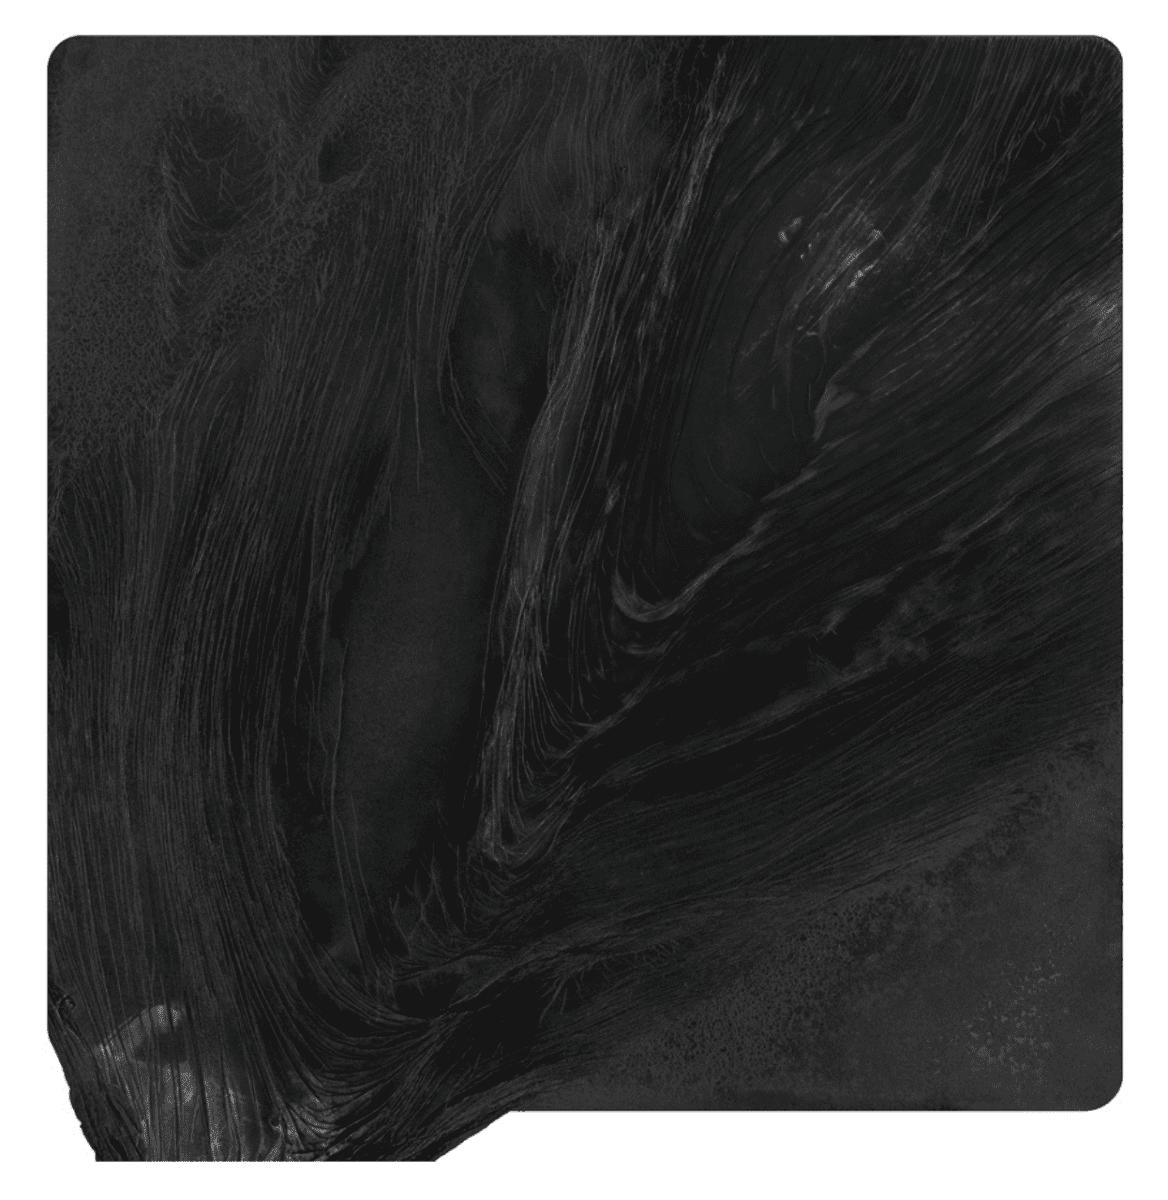 "Brittany Nelson, Gelatin Silver 4, Chromogenic Print, 40 ""x 40,"" 2015."